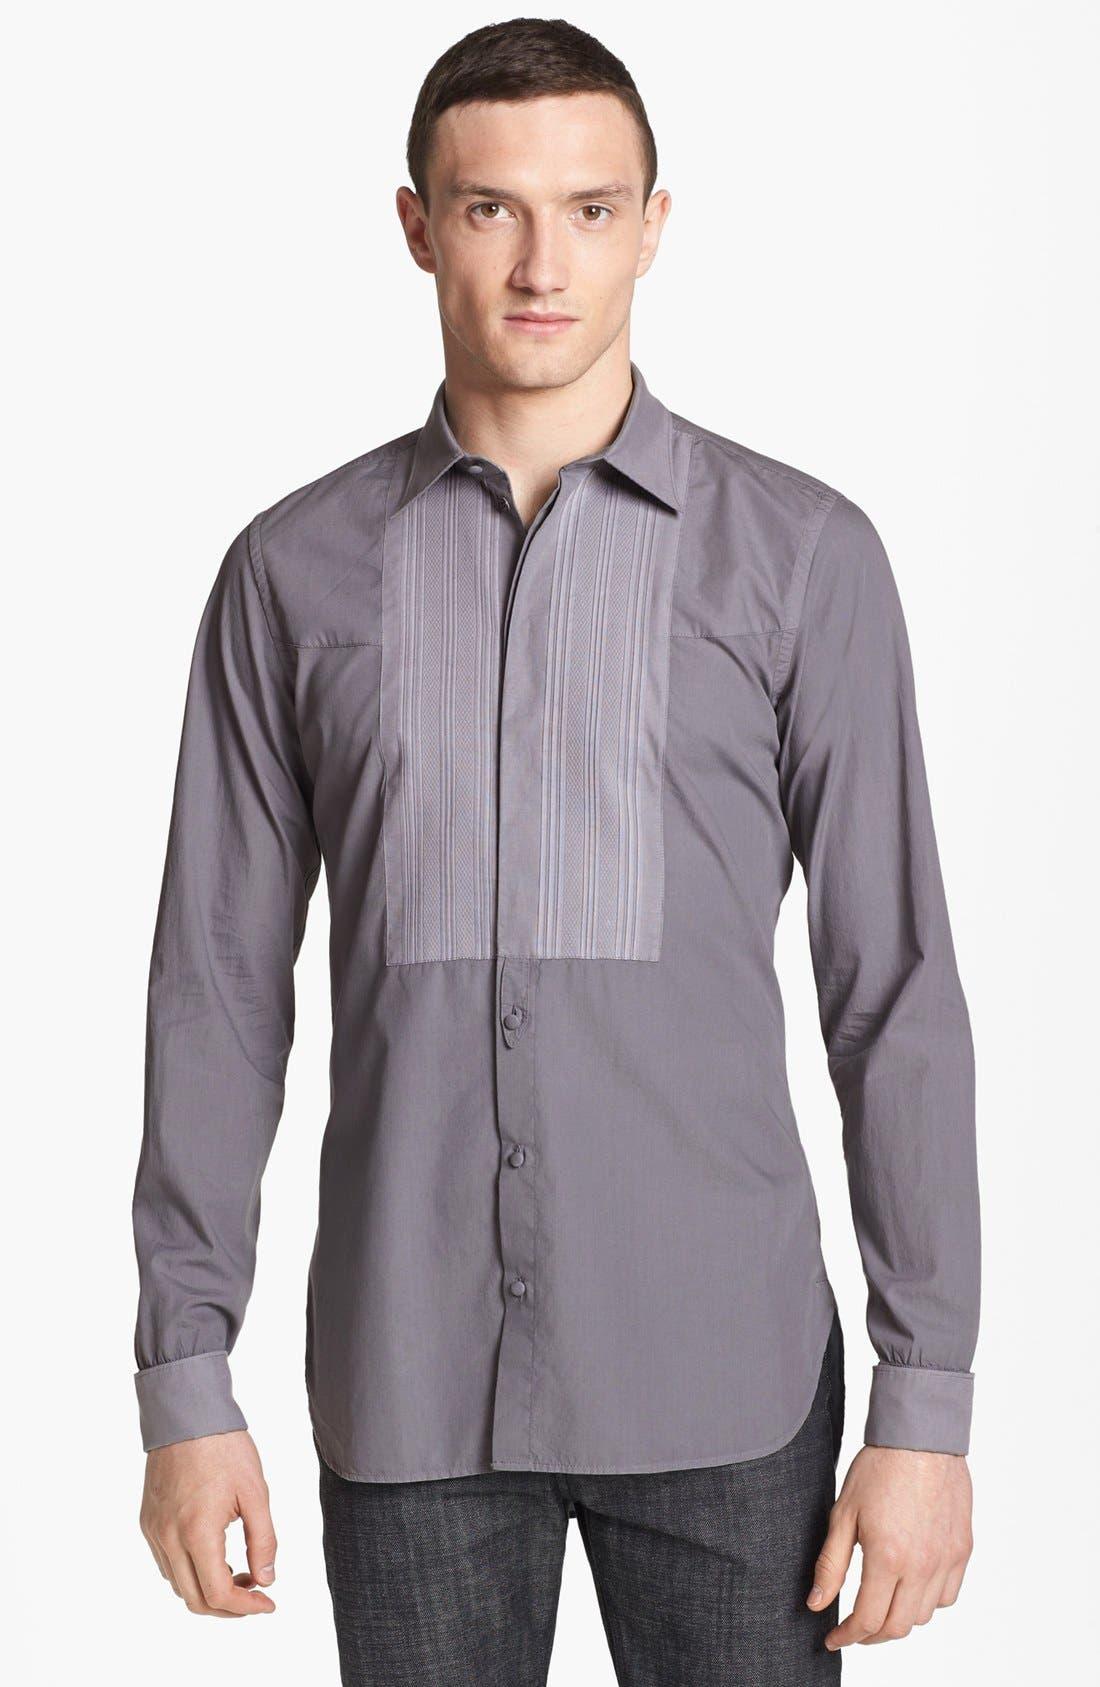 Alternate Image 1 Selected - Dolce&Gabbana Tuxedo Shirt